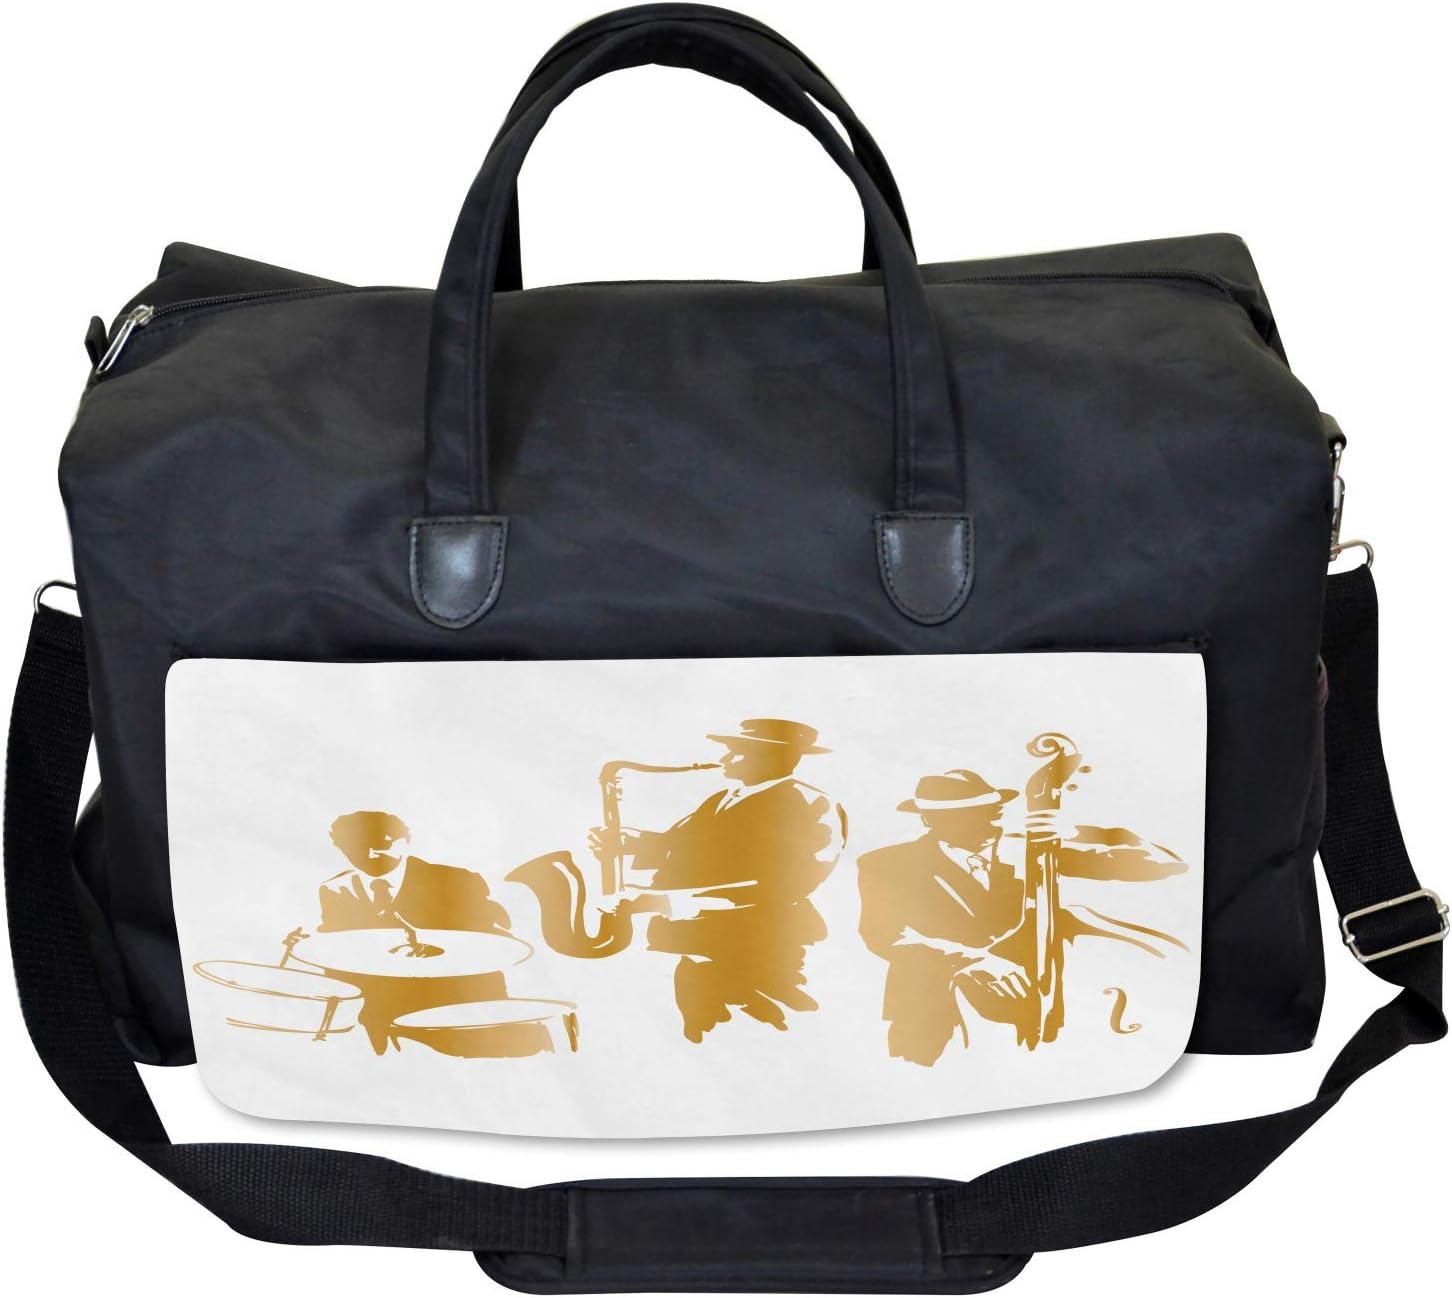 Ambesonne Vintage Gym Bag Large Weekender Carry-on Jazz Band Blues Music